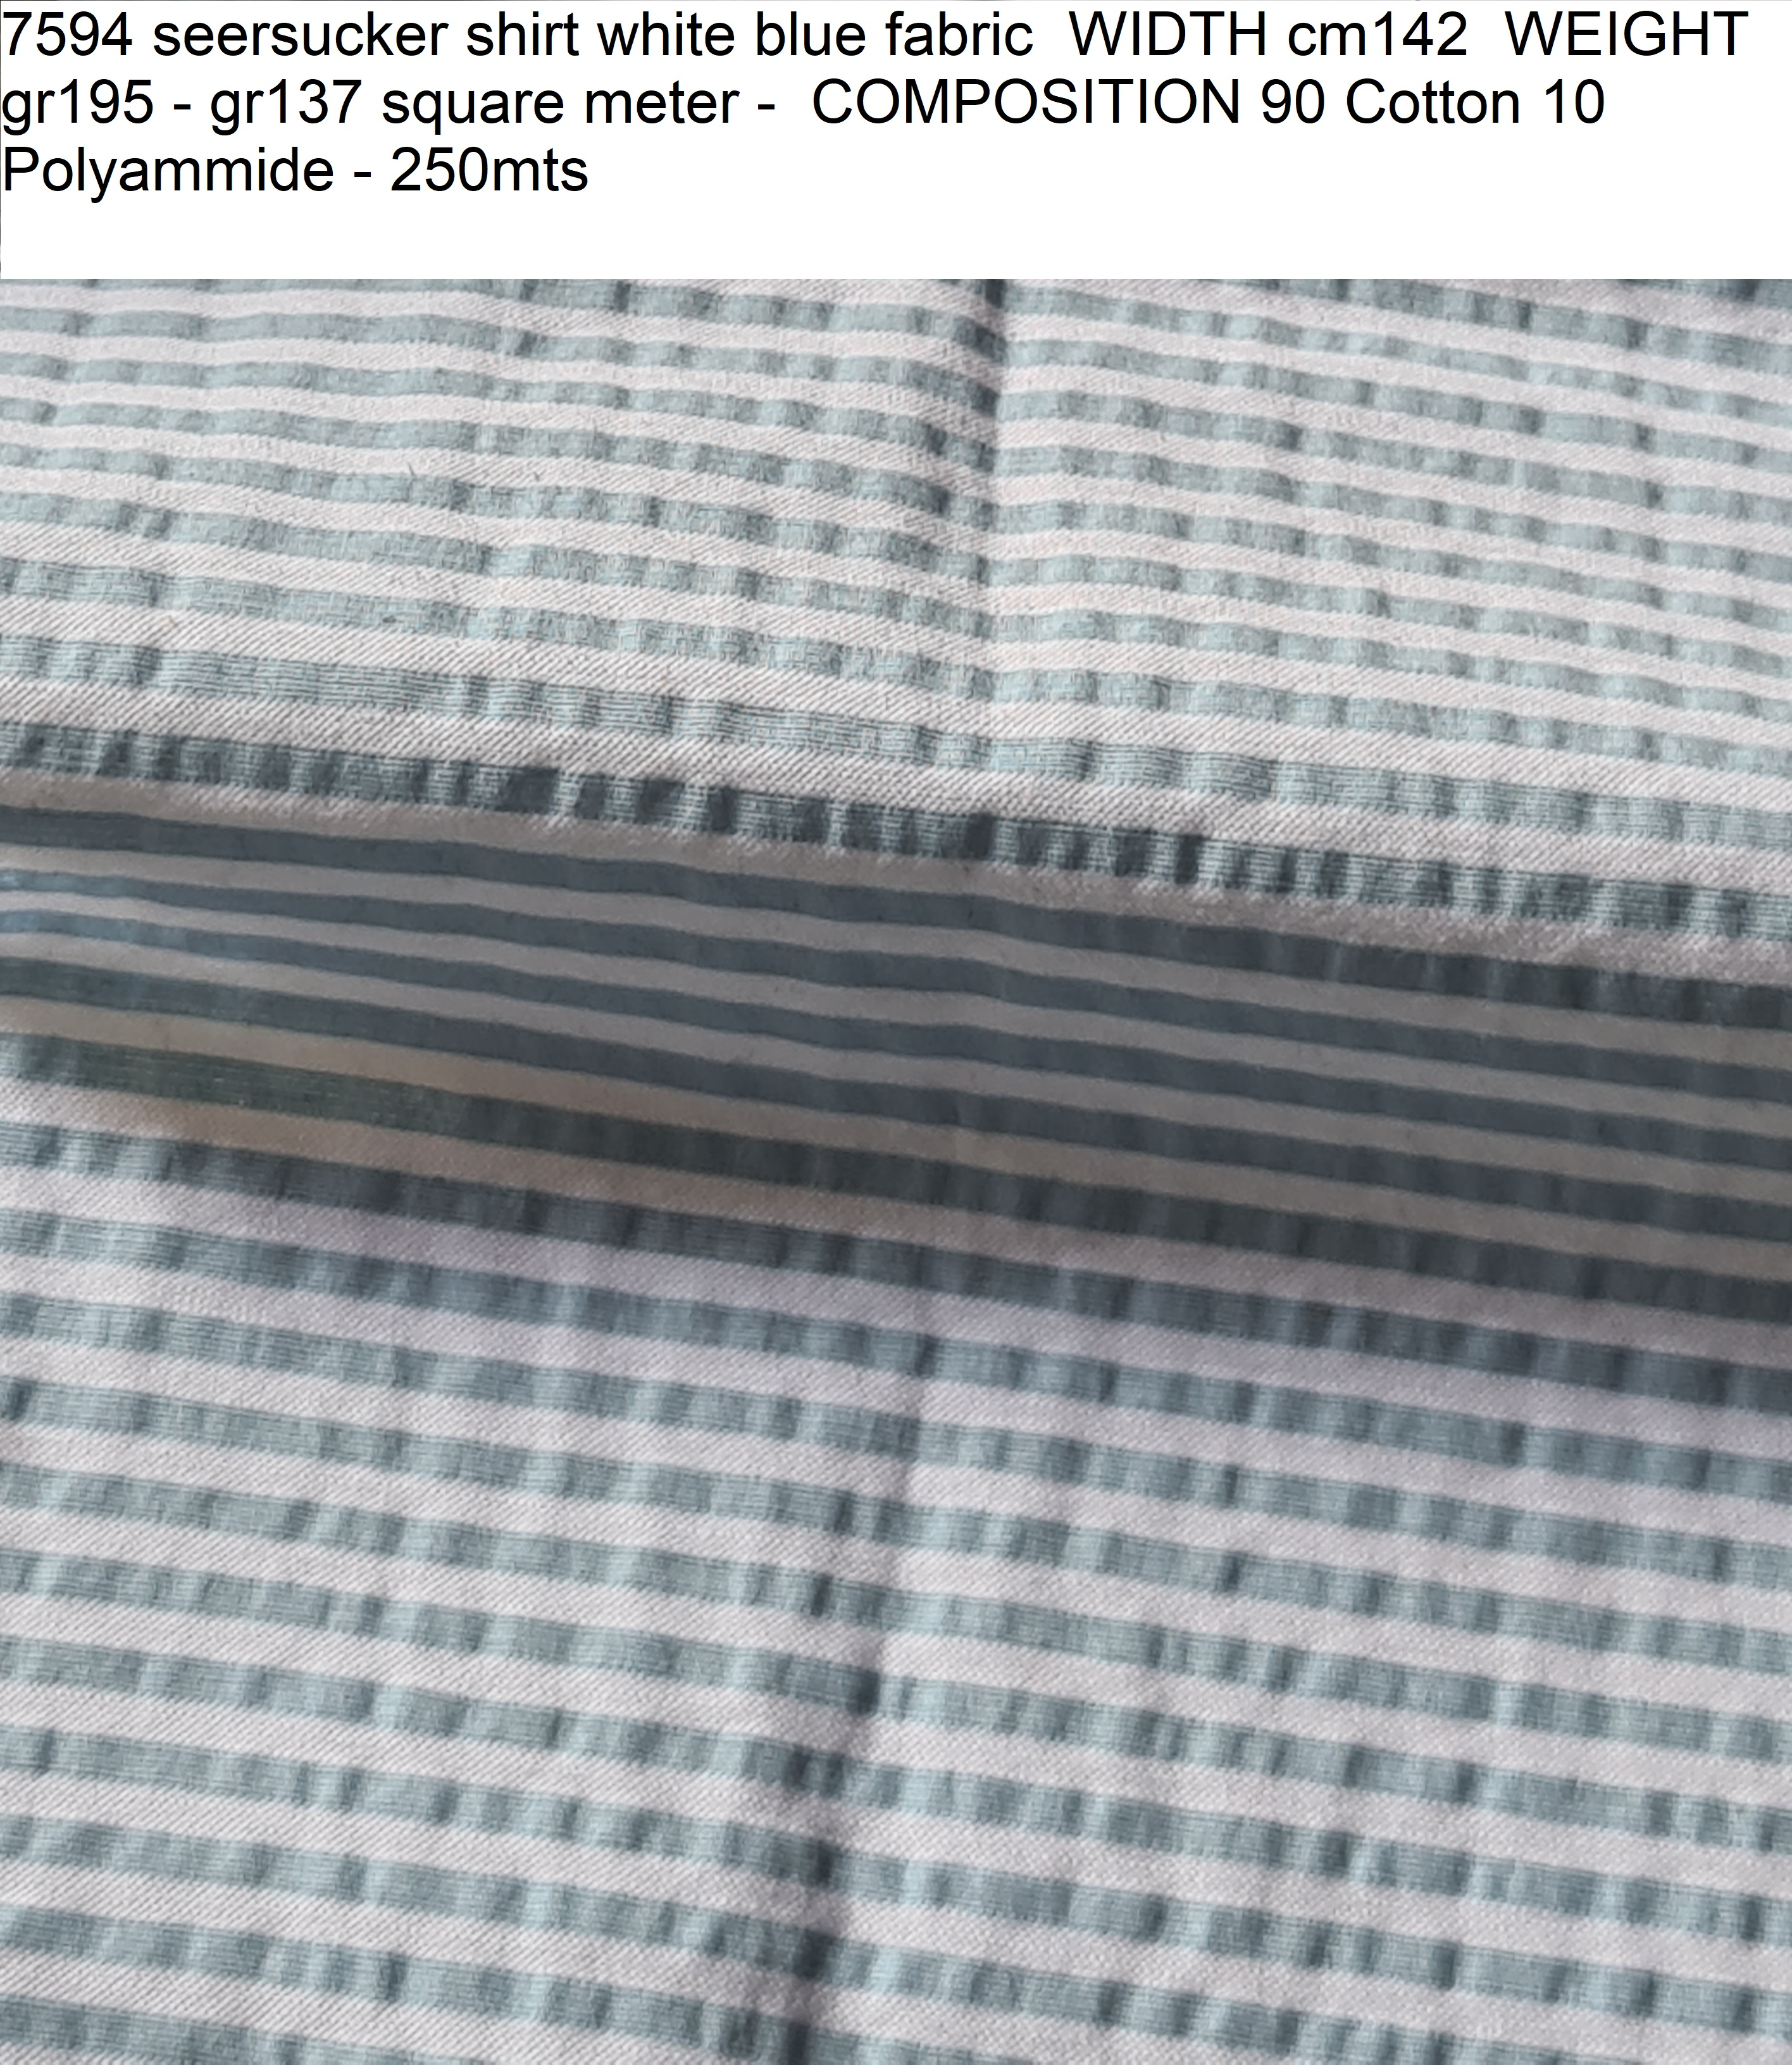 7594 seersucker shirt white blue fabric WIDTH cm142 WEIGHT gr195 - gr137 square meter - COMPOSITION 90 Cotton 10 Polyammide - 250mts